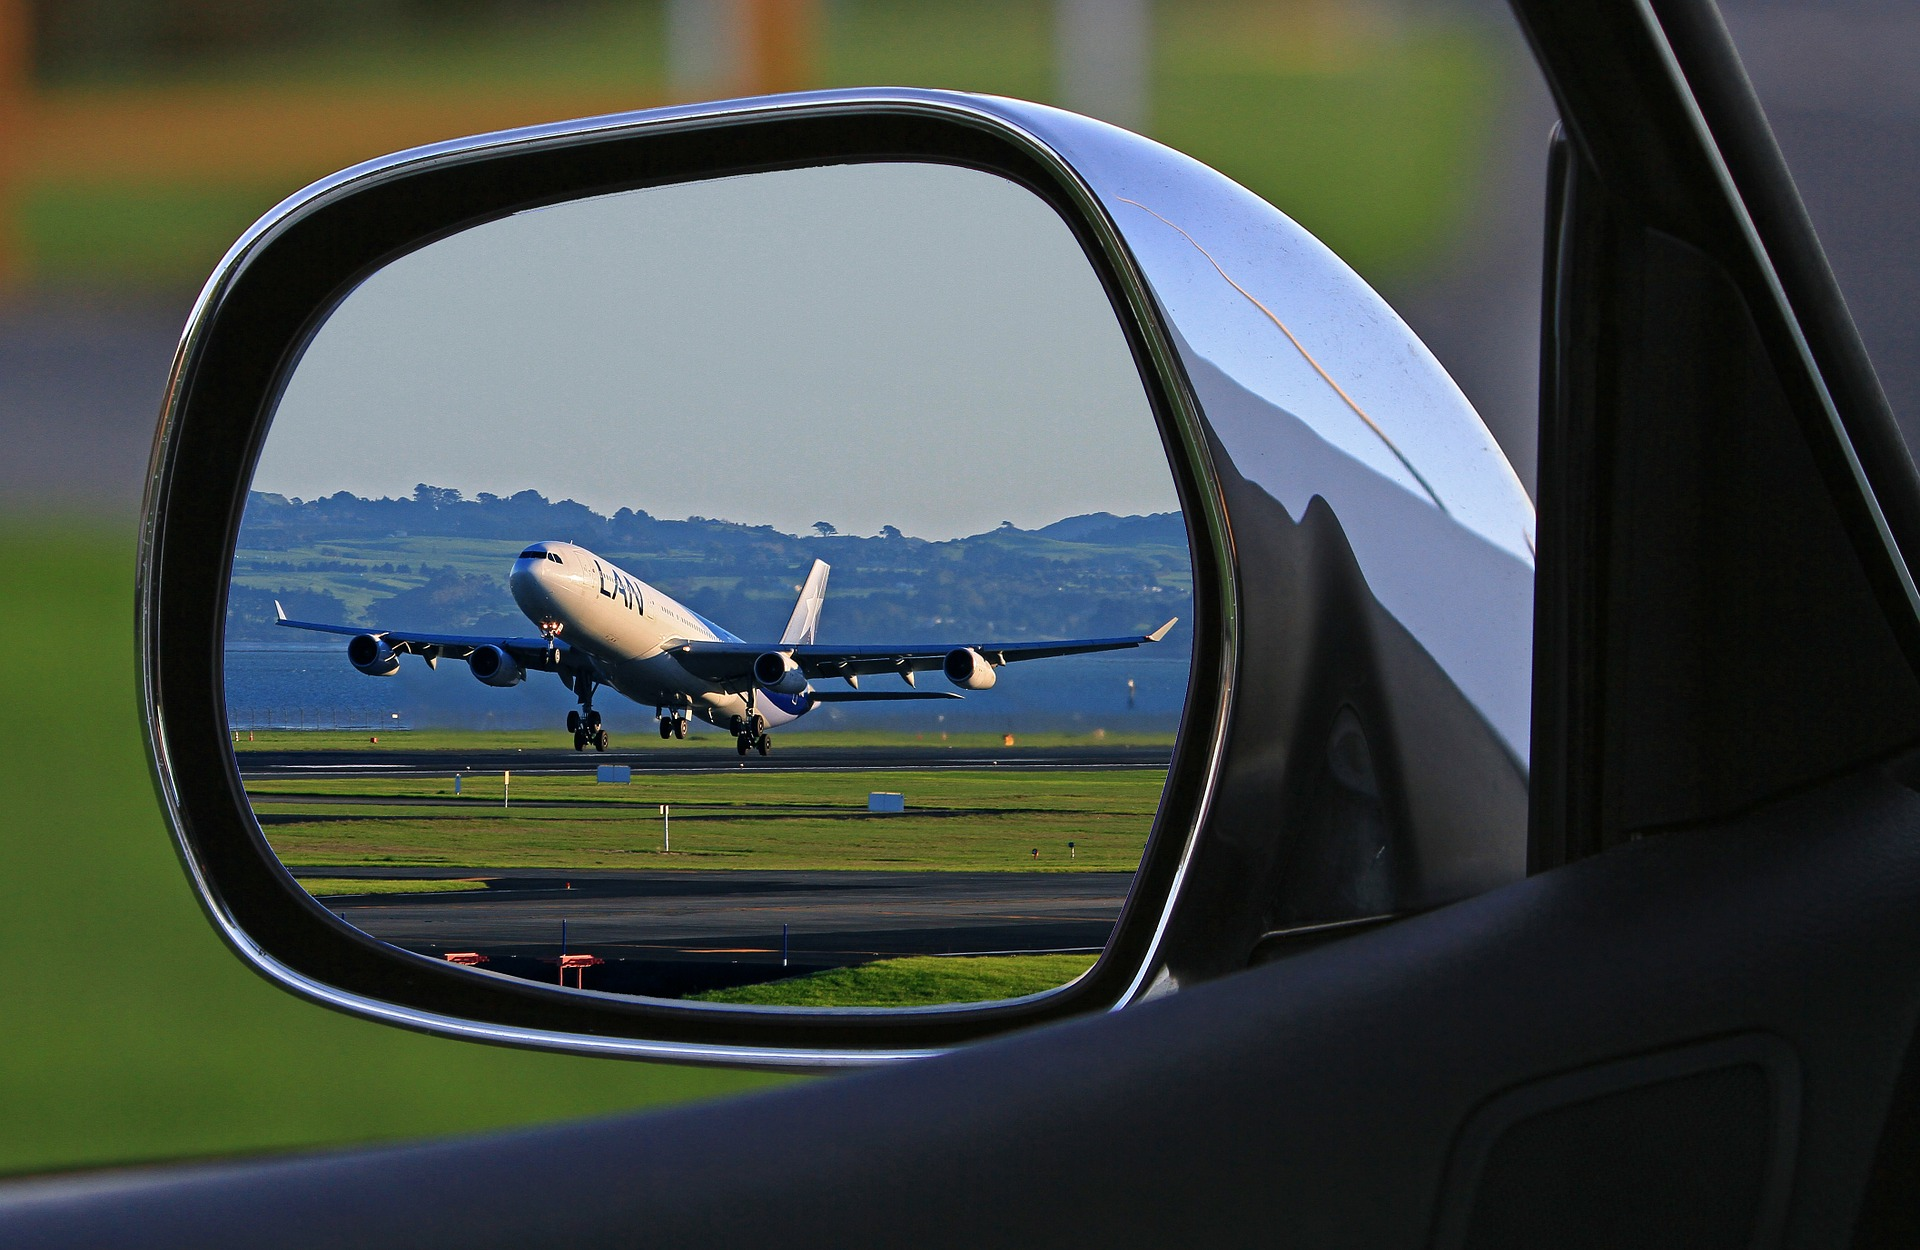 inchirieri masini din aeroport Craiova